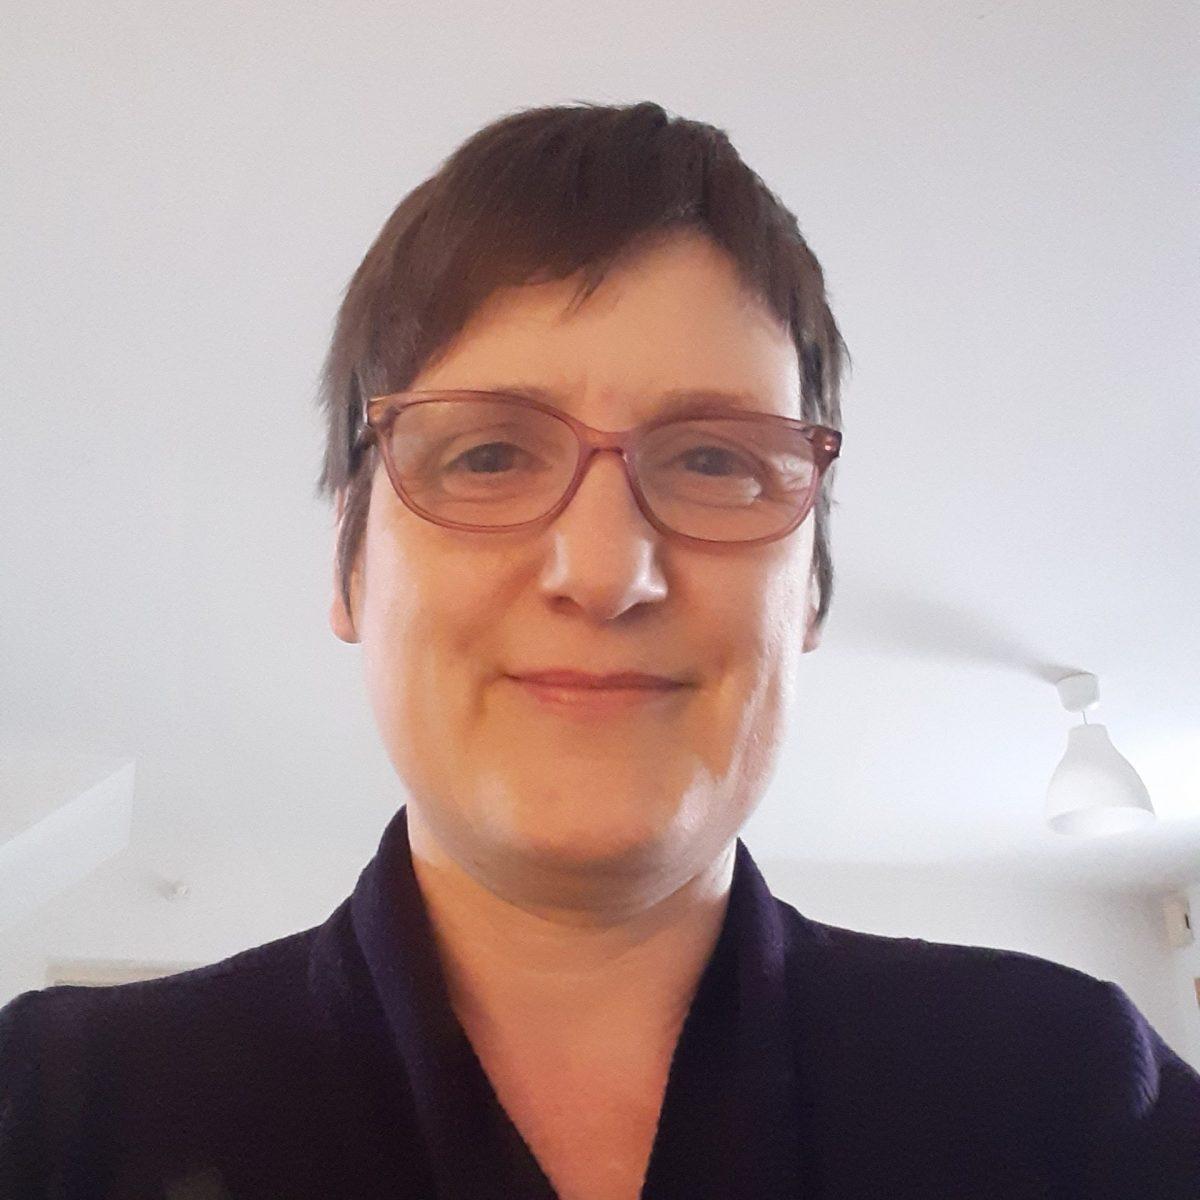 FARA Charity trustee Odile Rimbert